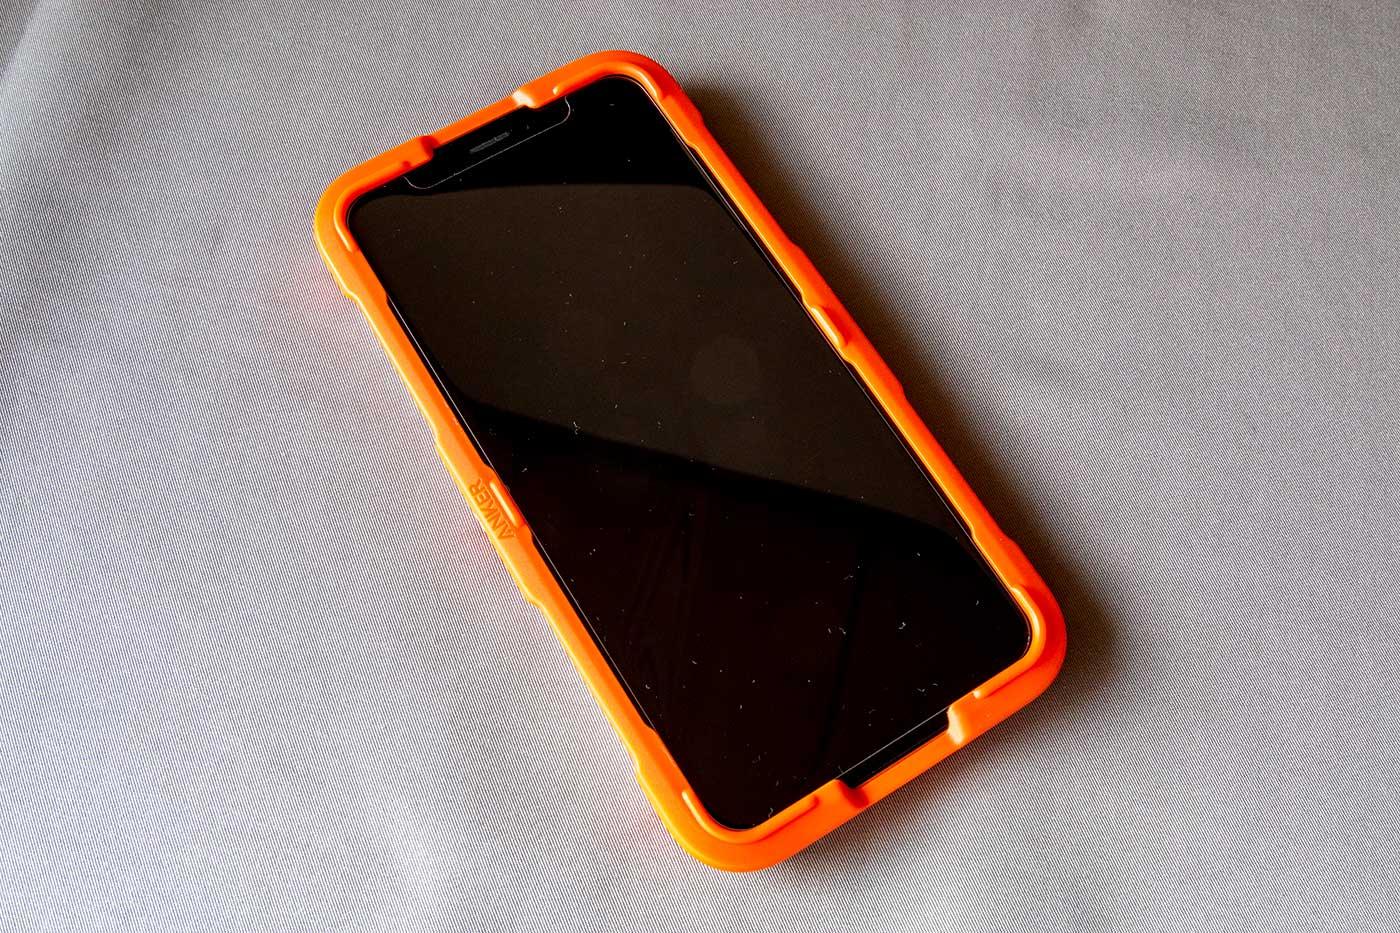 Anker GlassGuard iPhoneのガイド枠をiPhoneにはめる